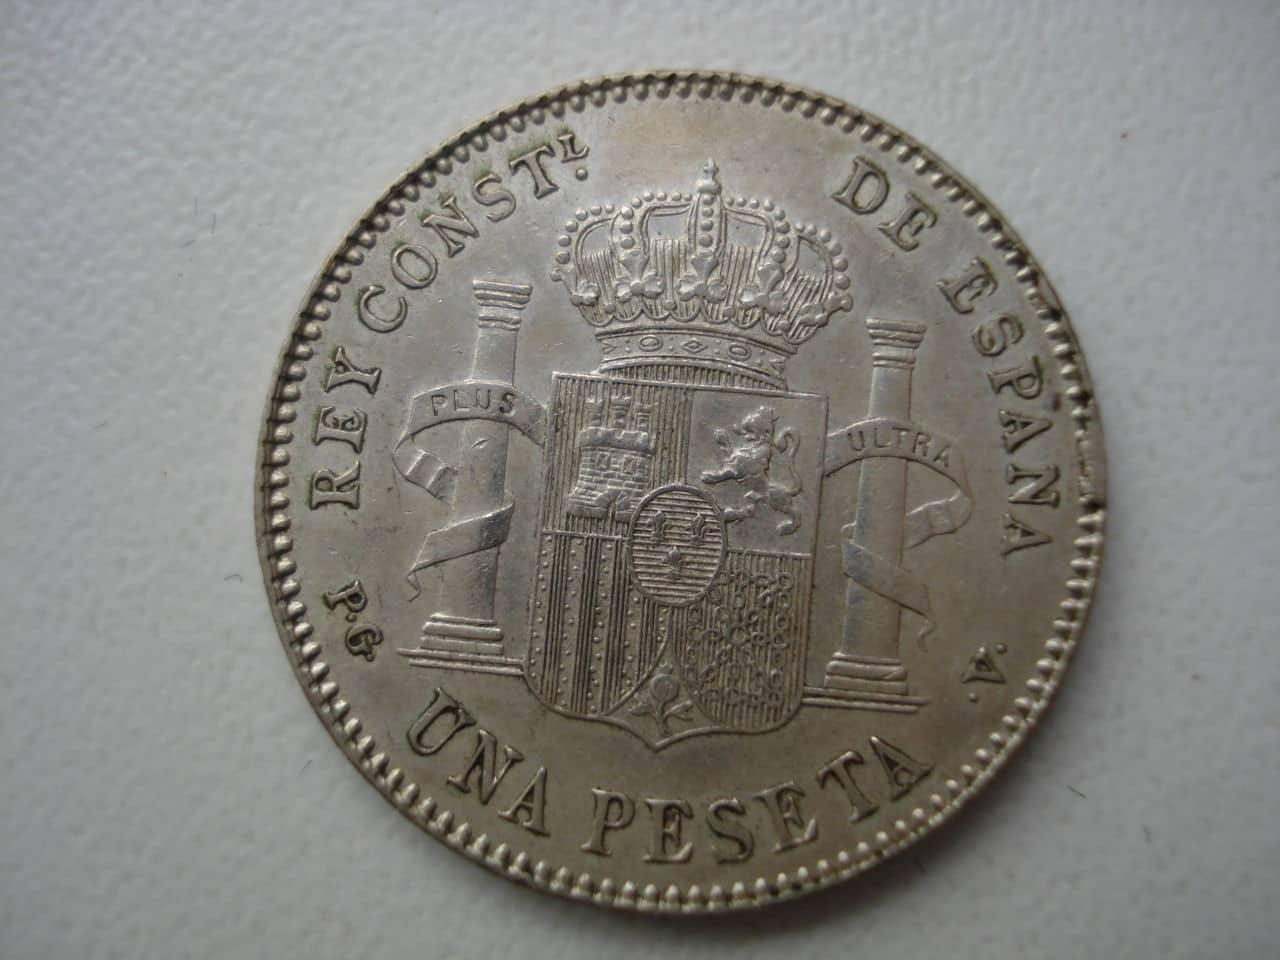 peseta 1896 Alfonso XIII. Dedicada a Estrella76. Monedas_008